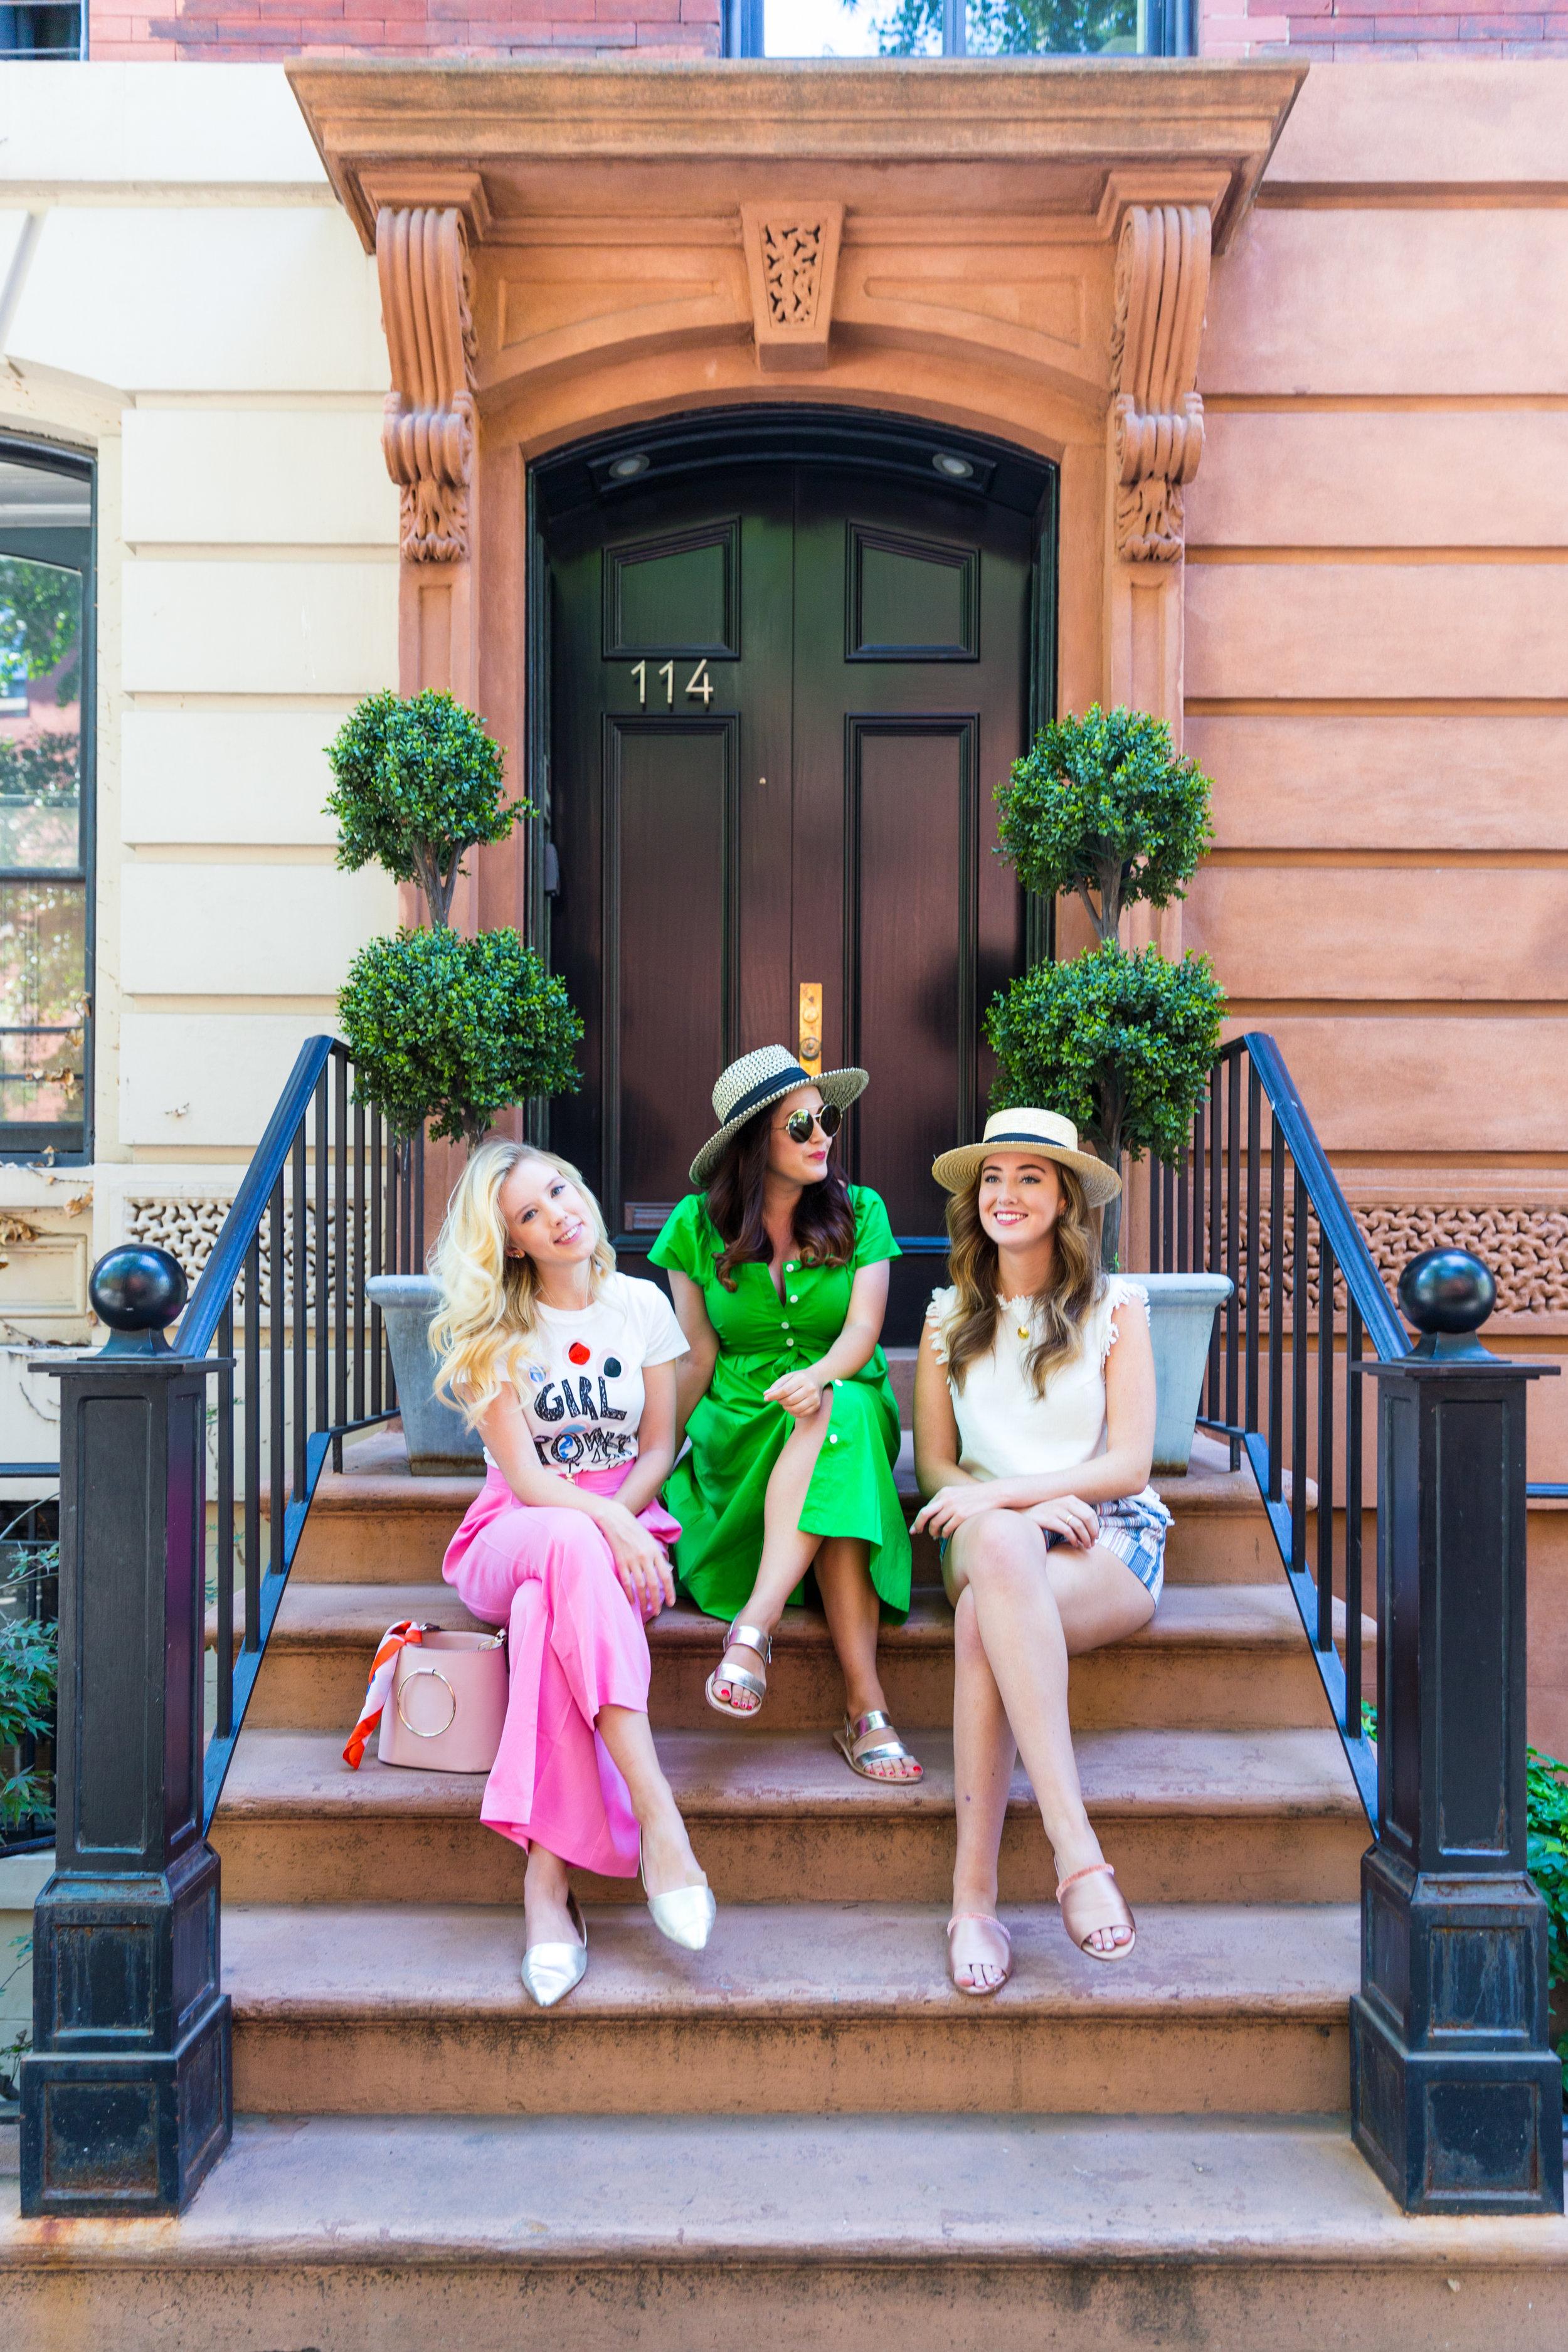 Summer Ethical Fashion NYC Pink Pants Girl Power Shirt-2.jpg